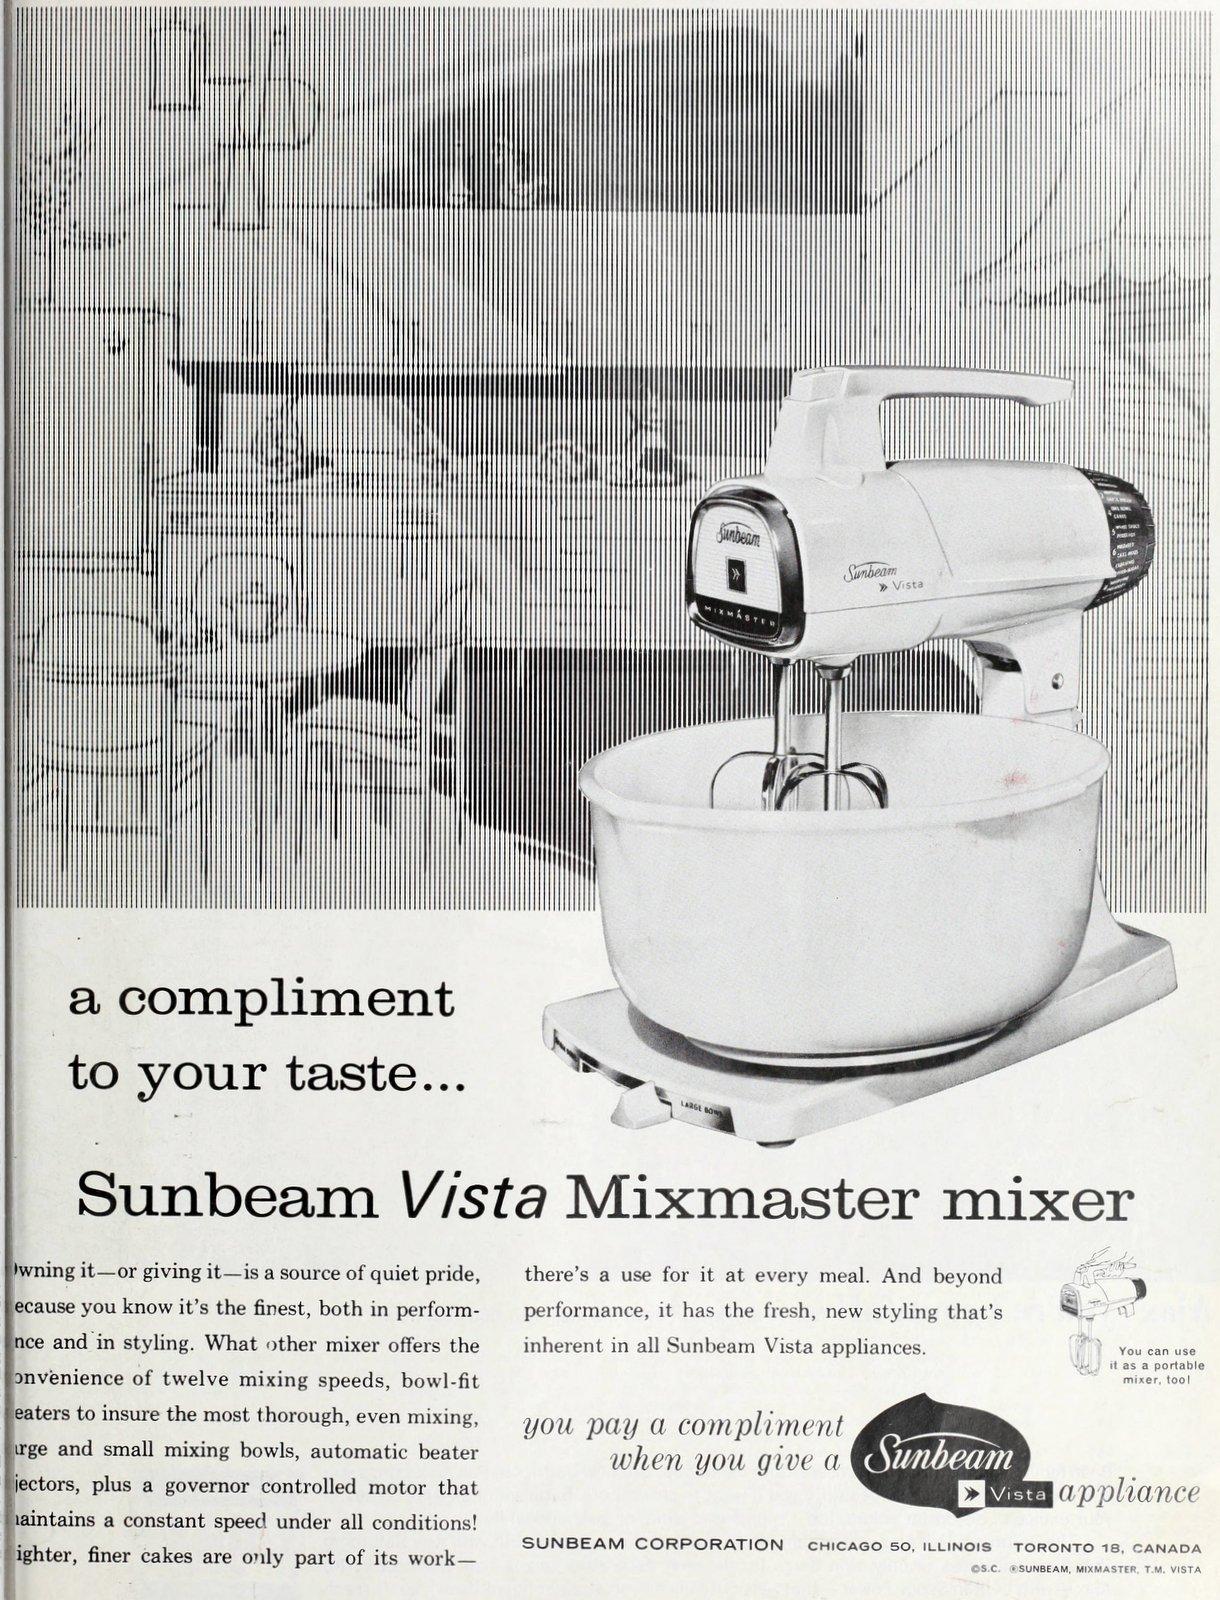 Vintage Sunbeam Vista Mixmaster mixer (1963)